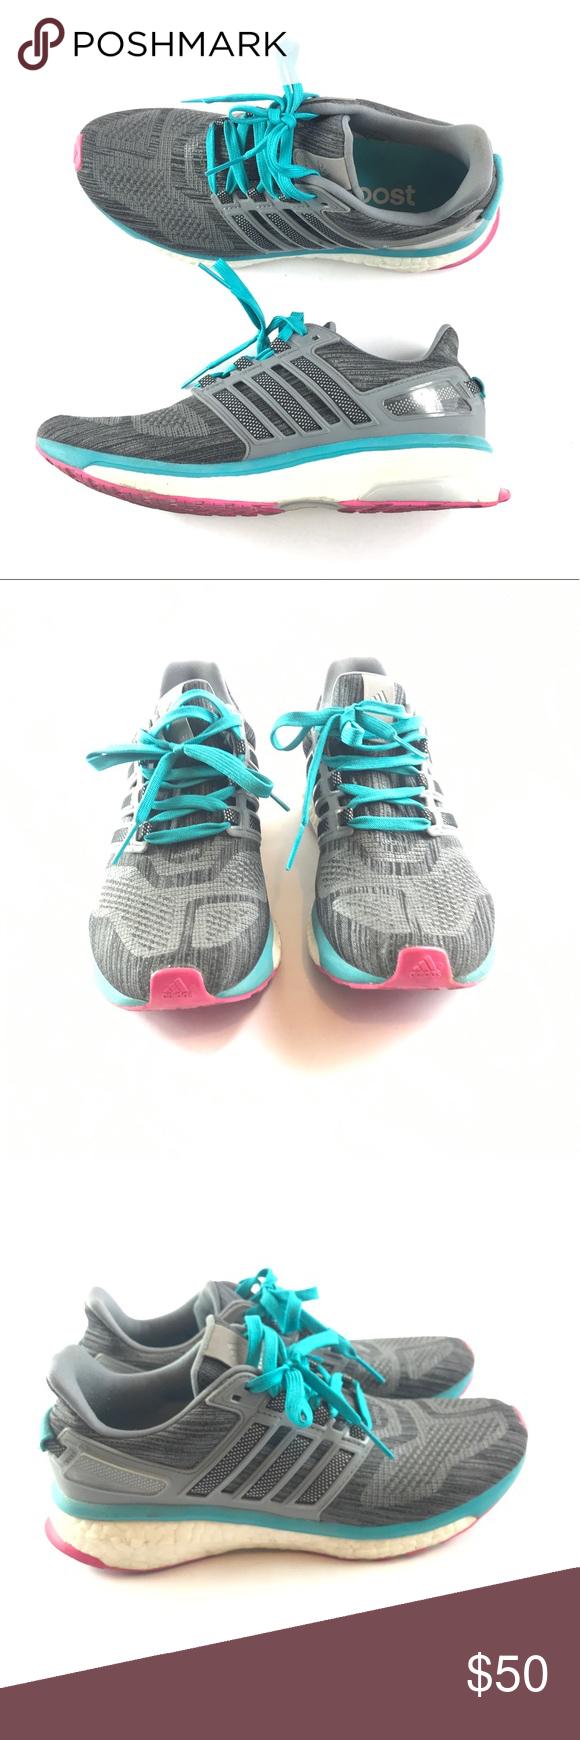 Adidas Energy Boost Endless Energy Shoes   Shoes, Adidas, Adidas women